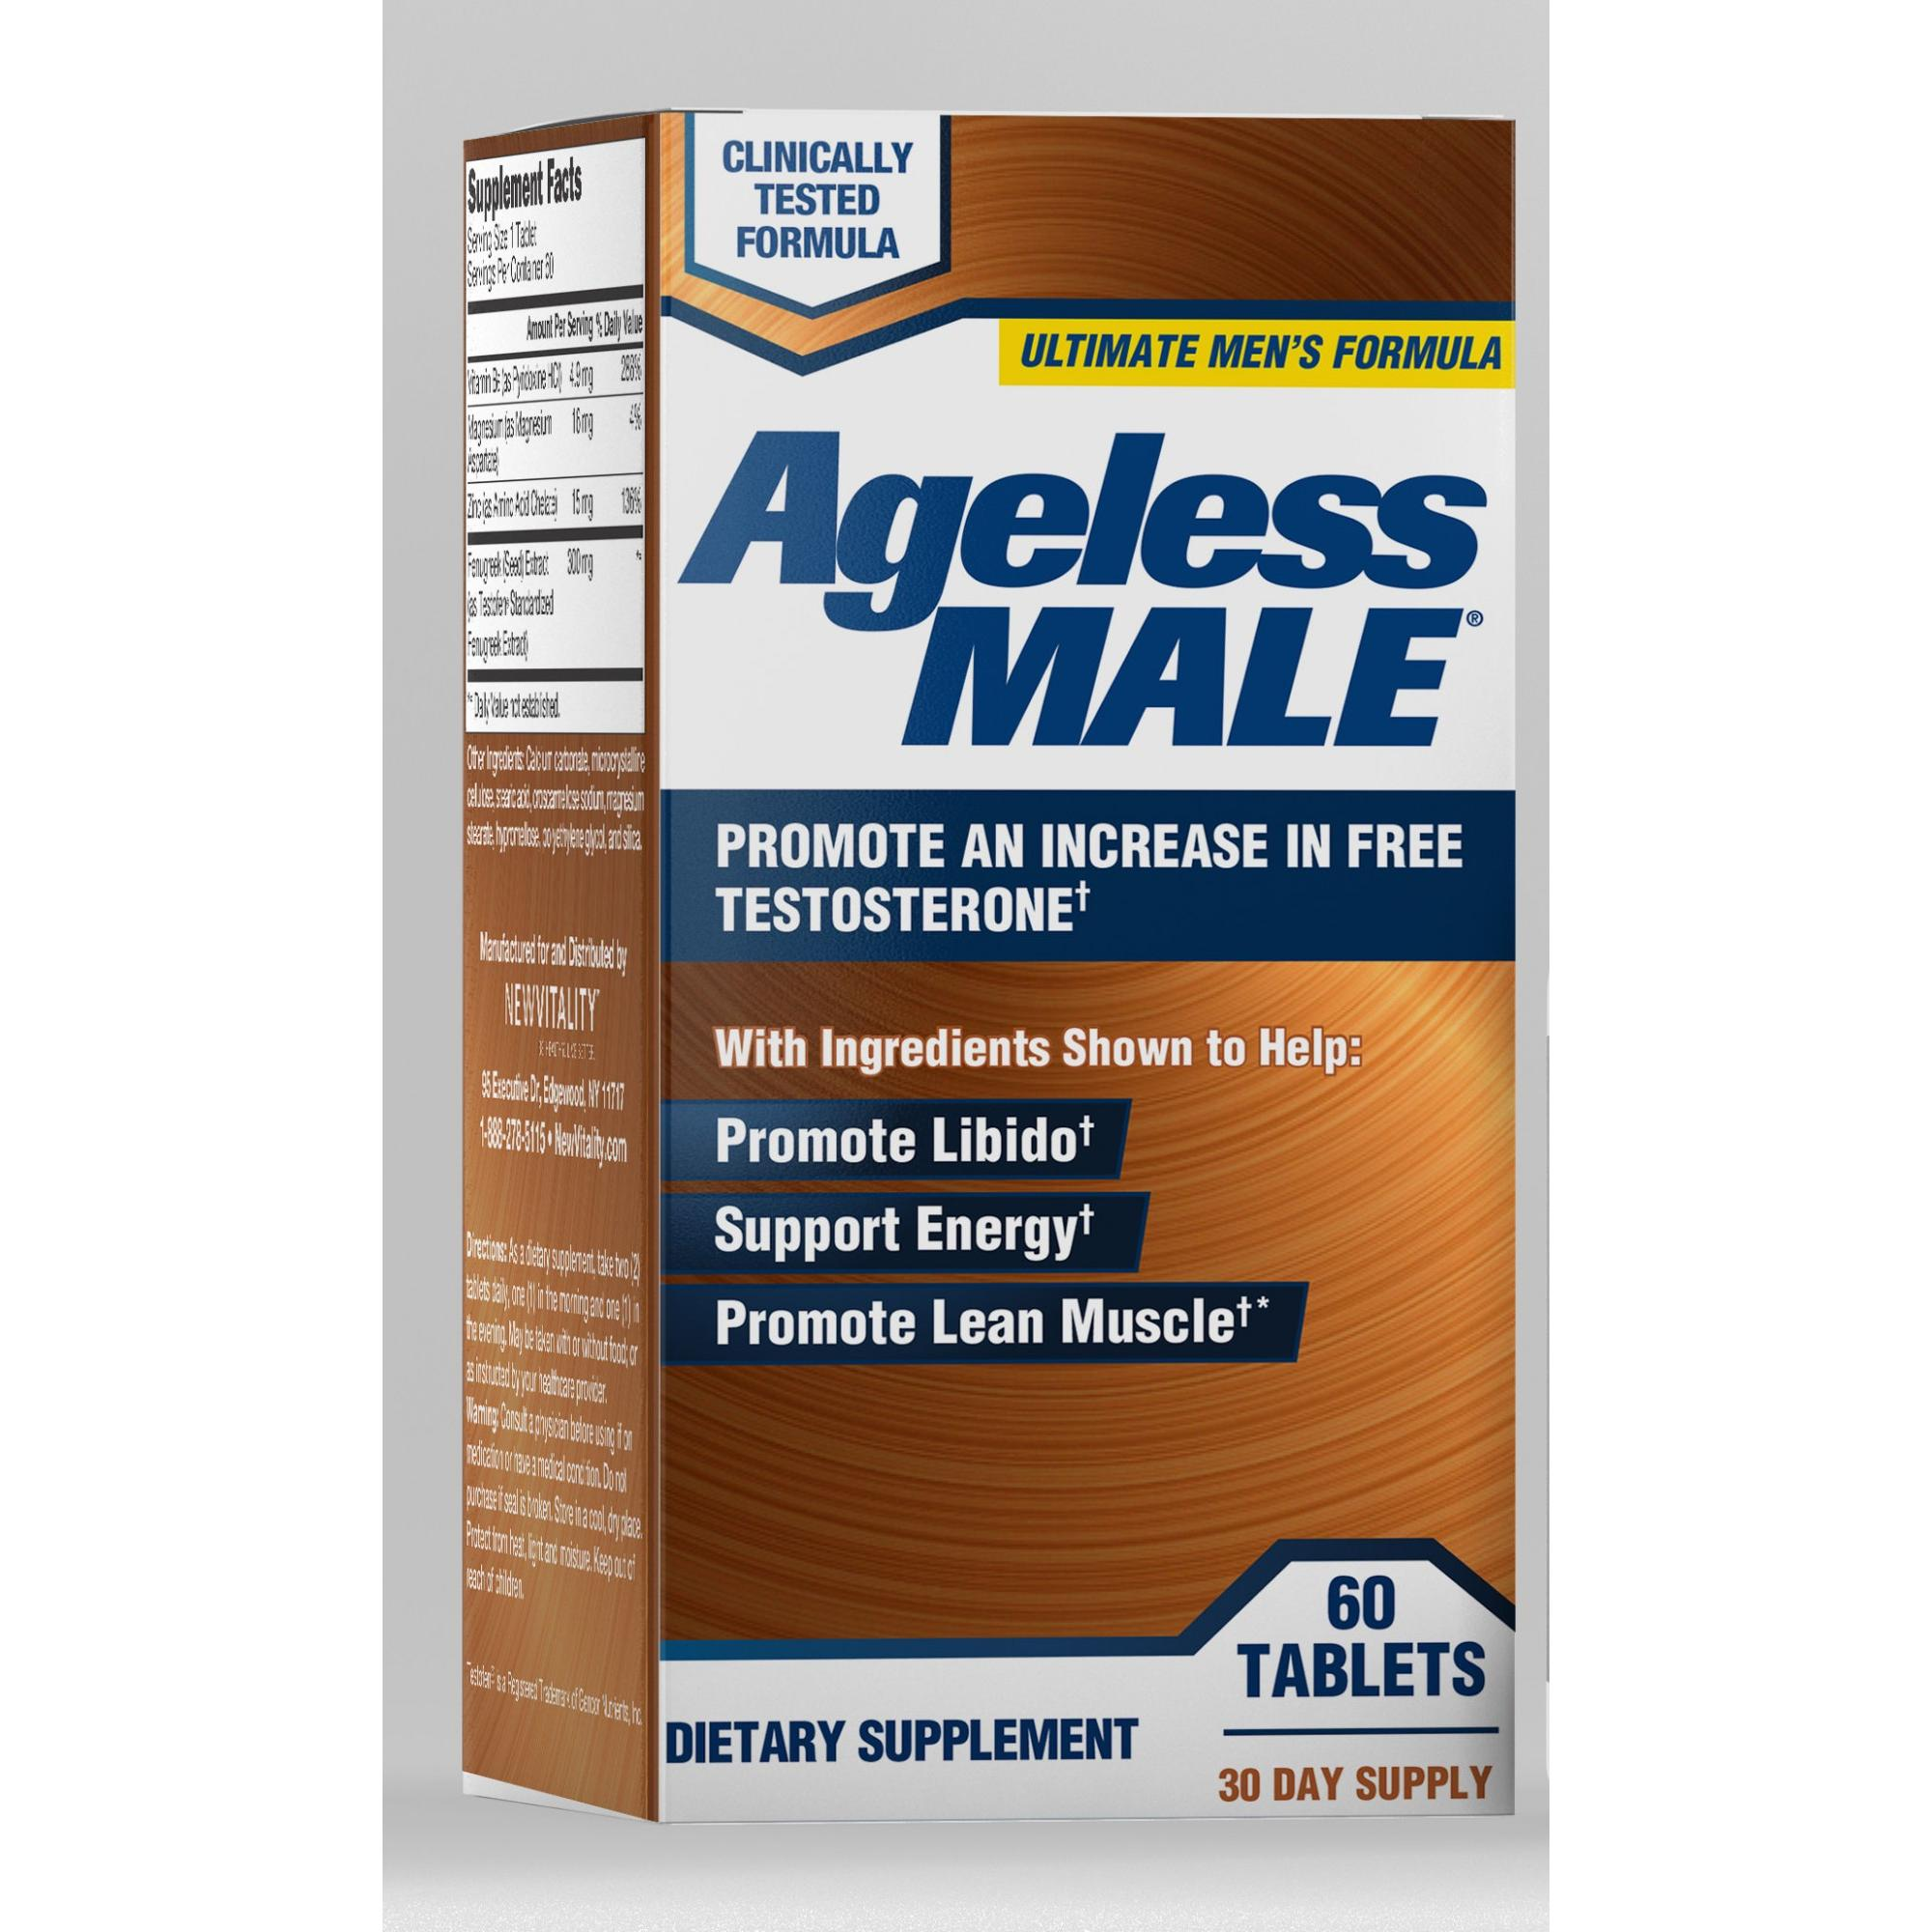 Ageless Male Free Testosterone Booster with Testofen Capsules 60 Ct - Walmart.com - Walmart.com